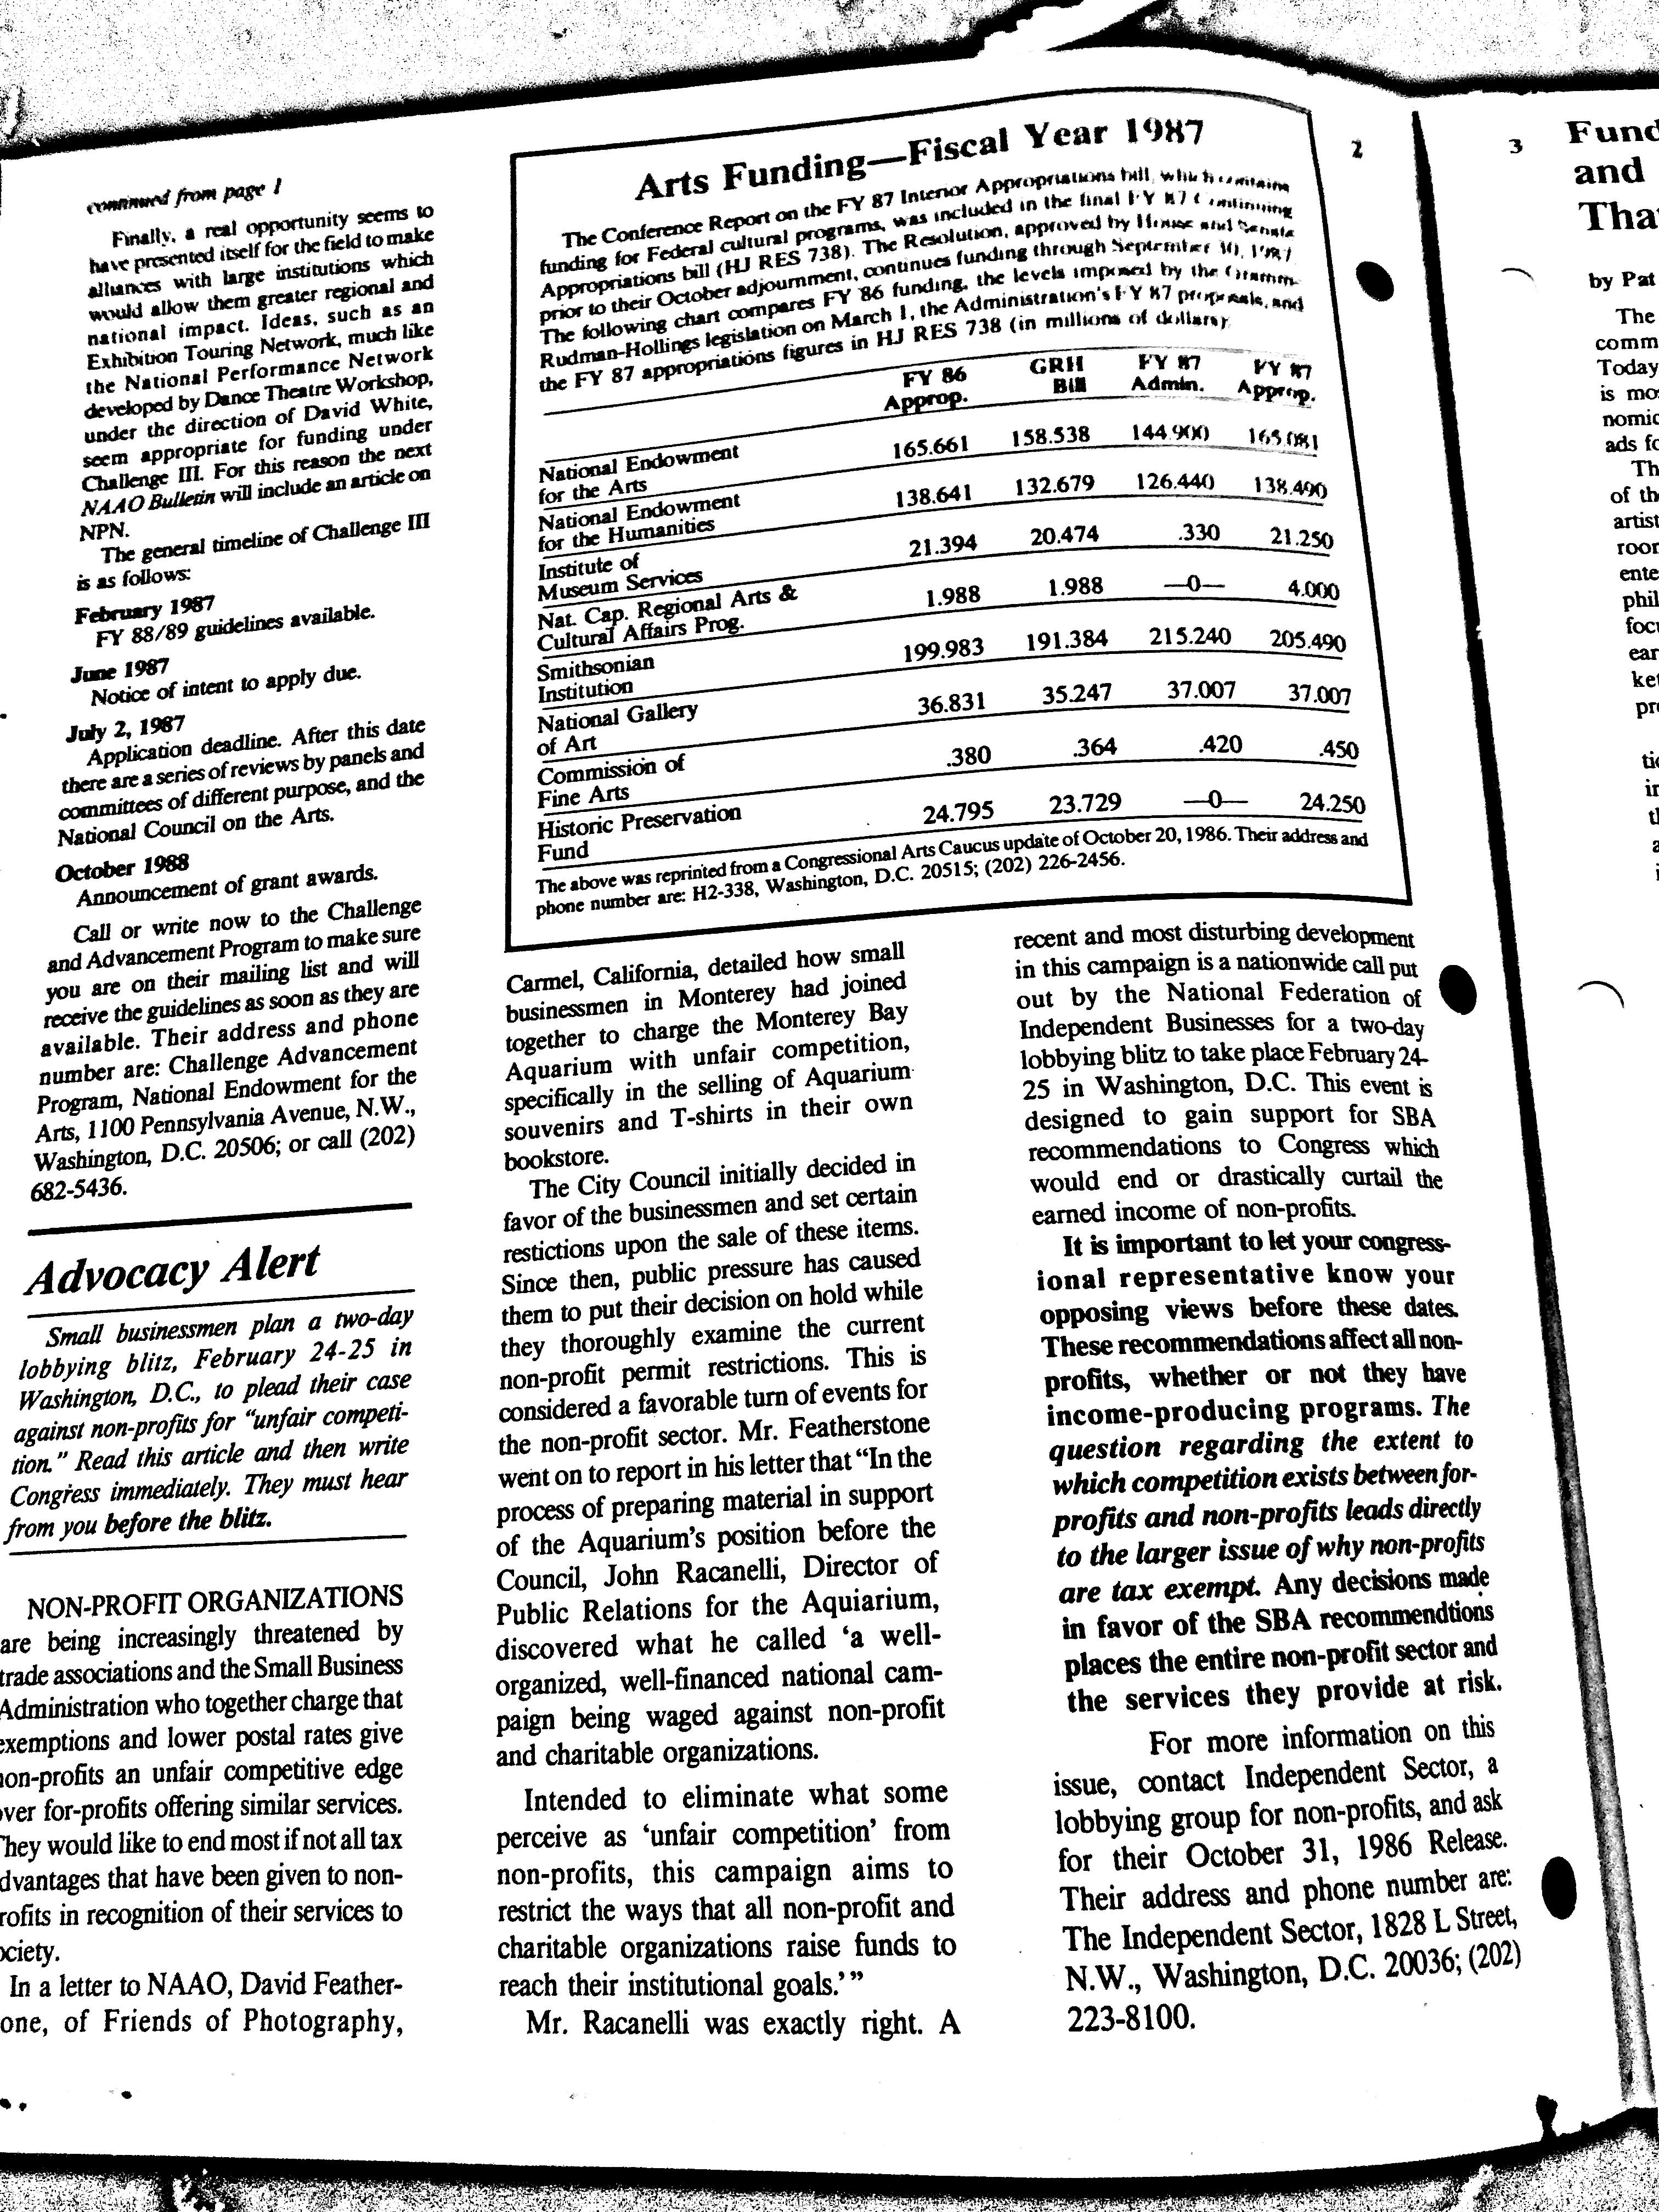 November-December 1986 - NAAO Bulletin Page 2 (1).jpg